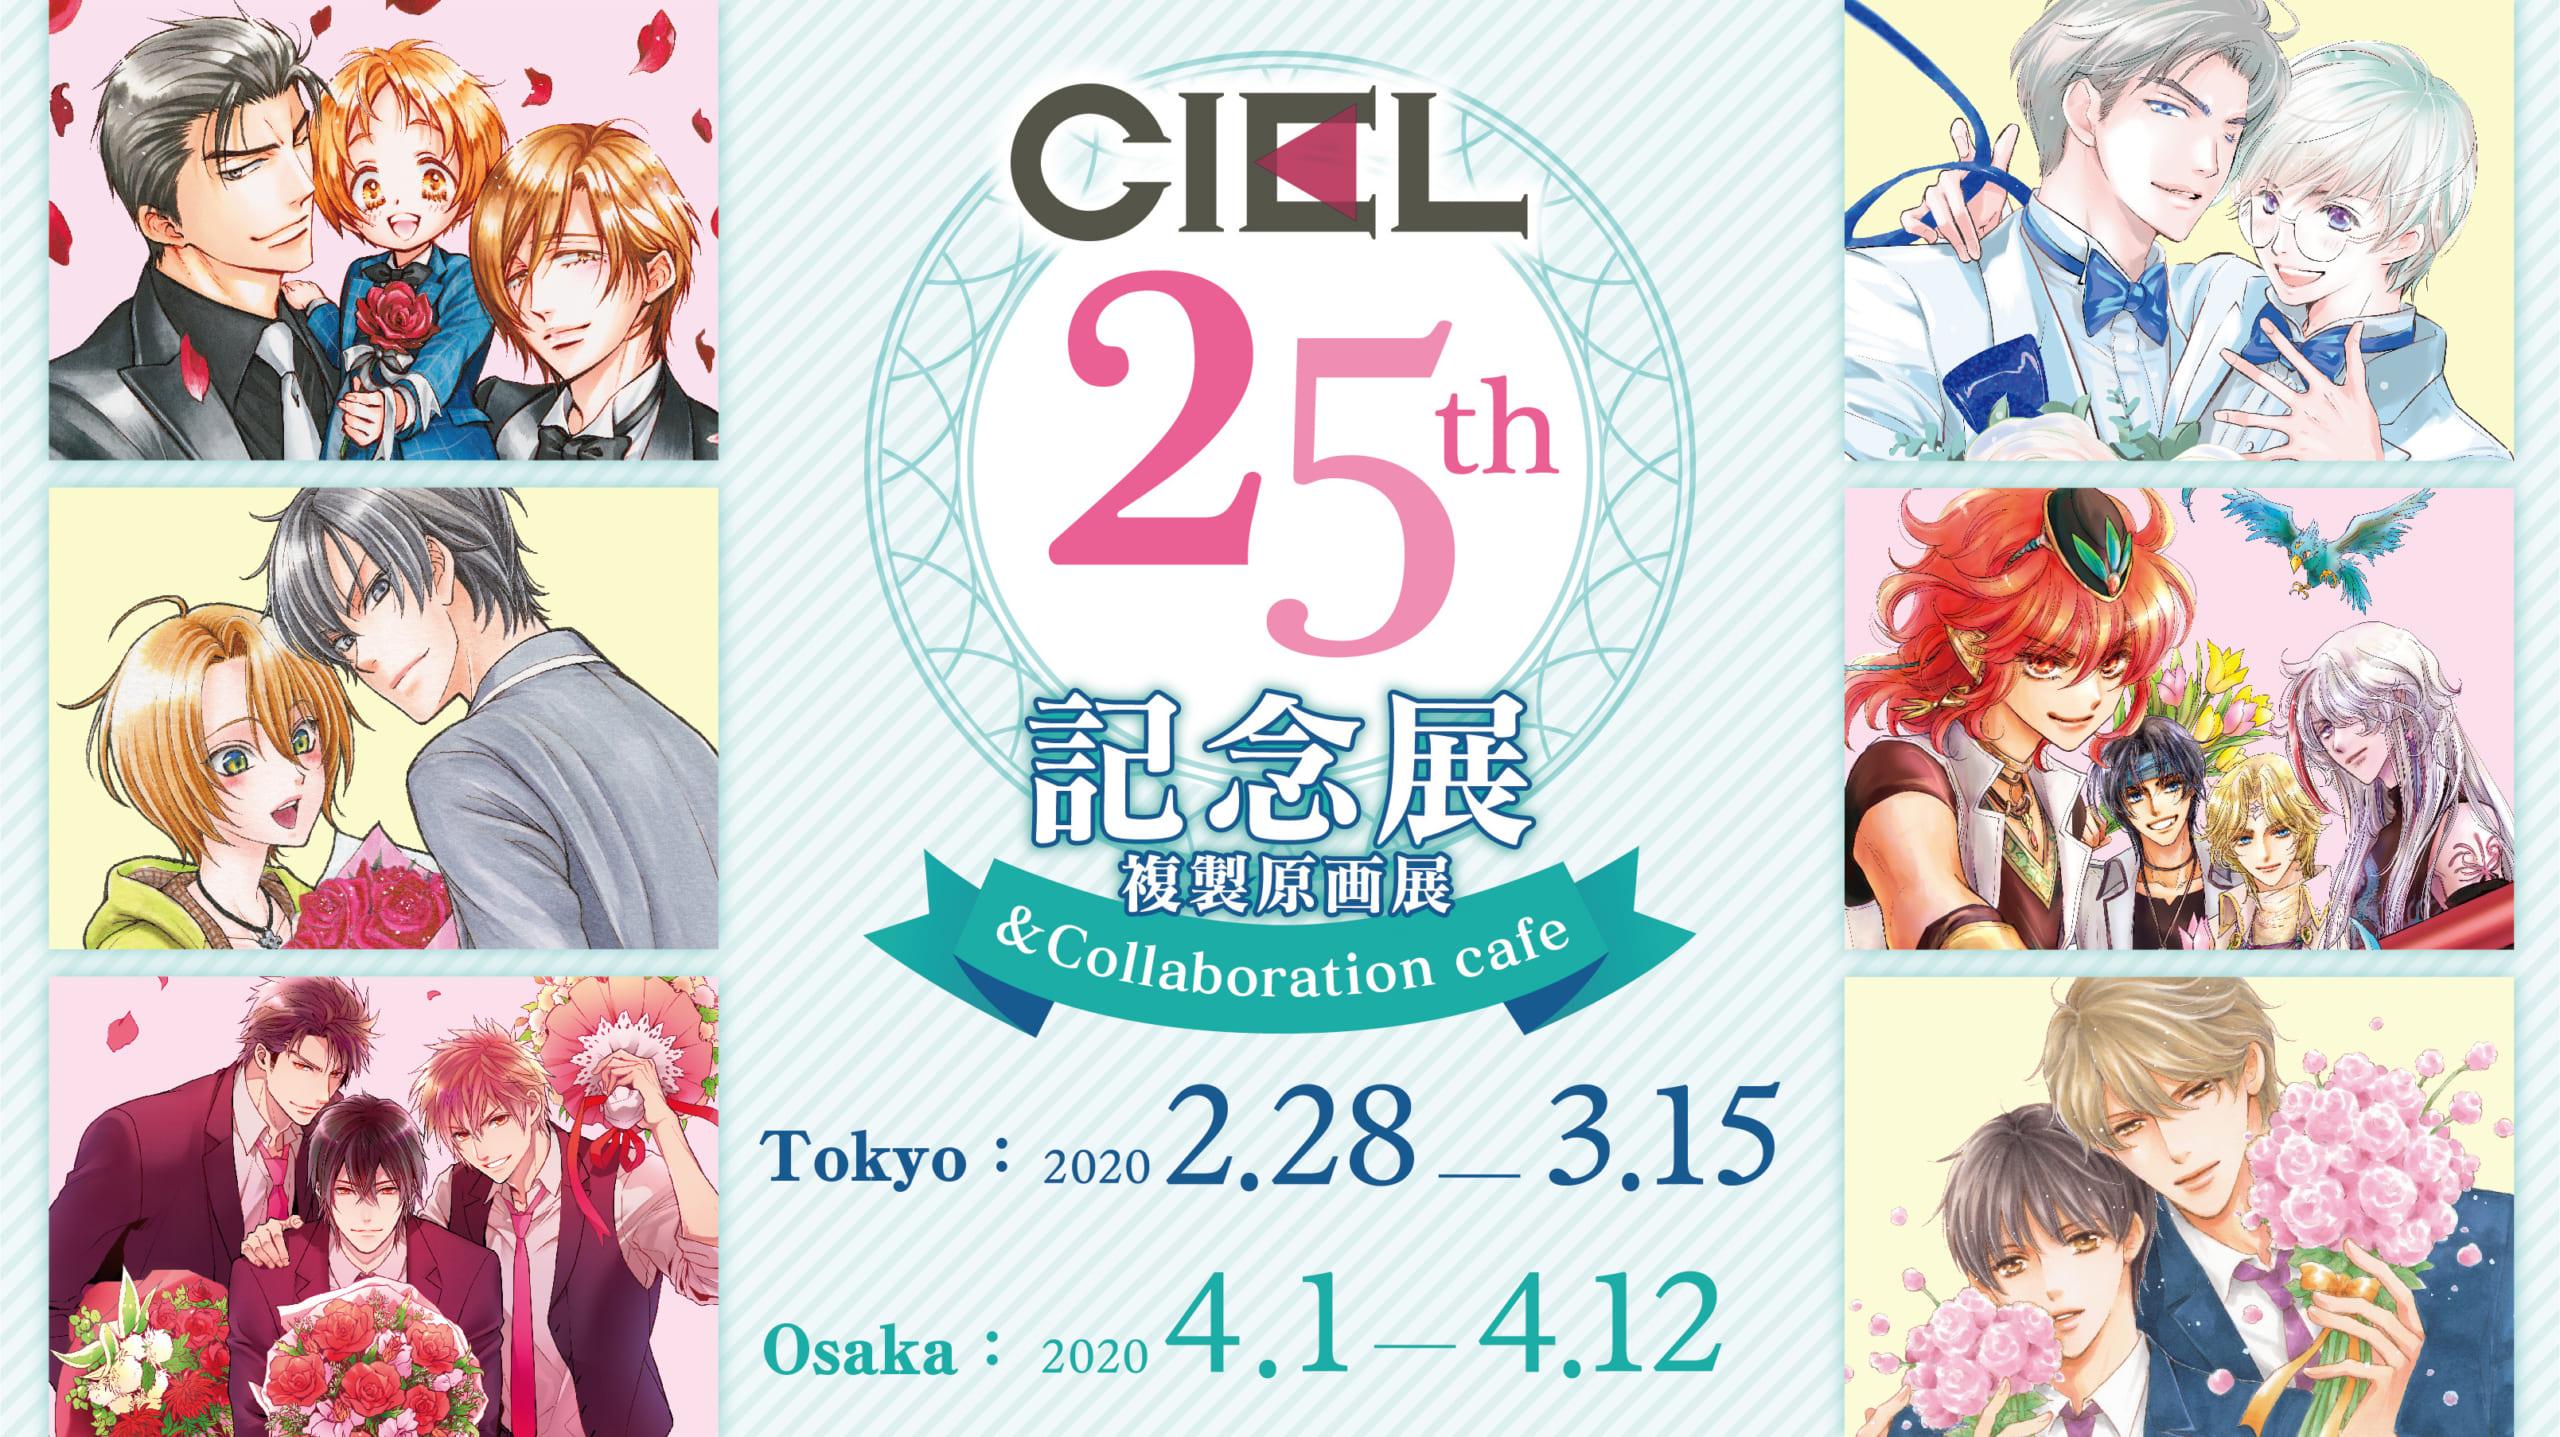 BL雑誌「CIEL」が25周年記念展開催!飯田橋虜など東京・大阪にて限定グッズ販売や複製原画を展示